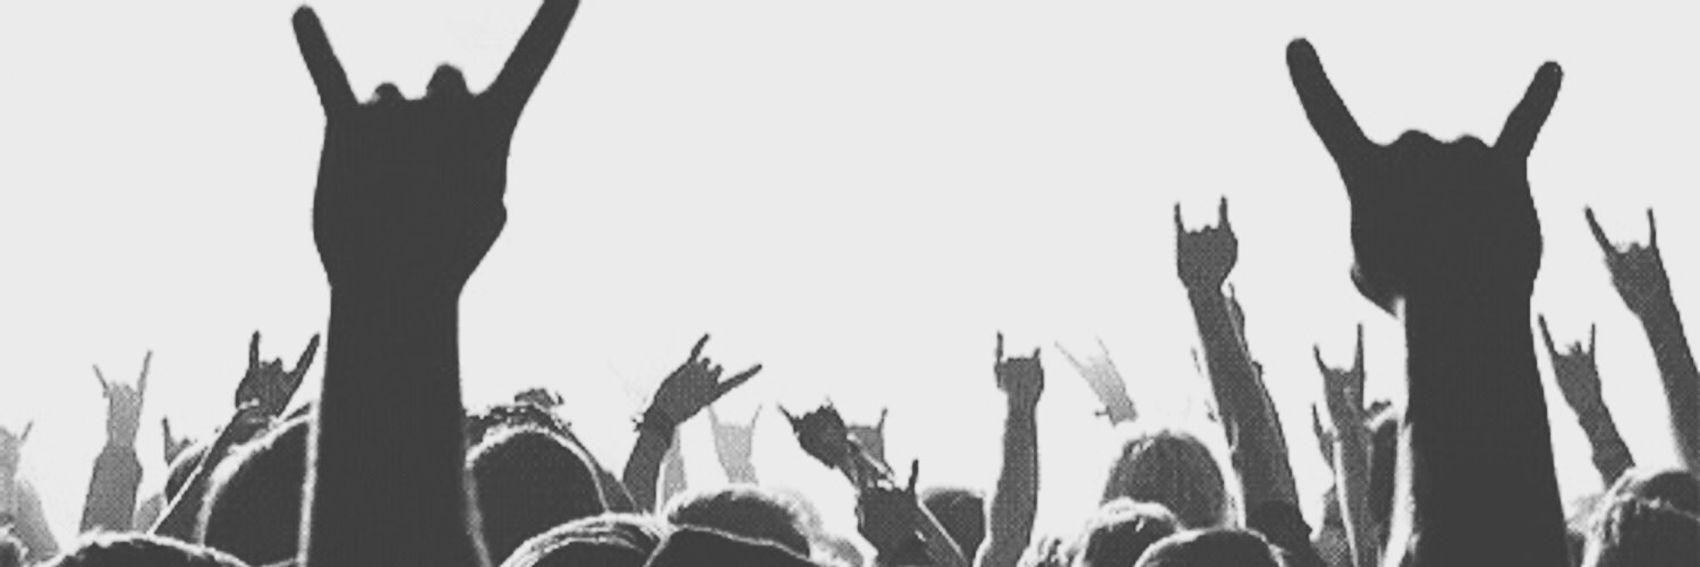 ?. Moshpit Concert